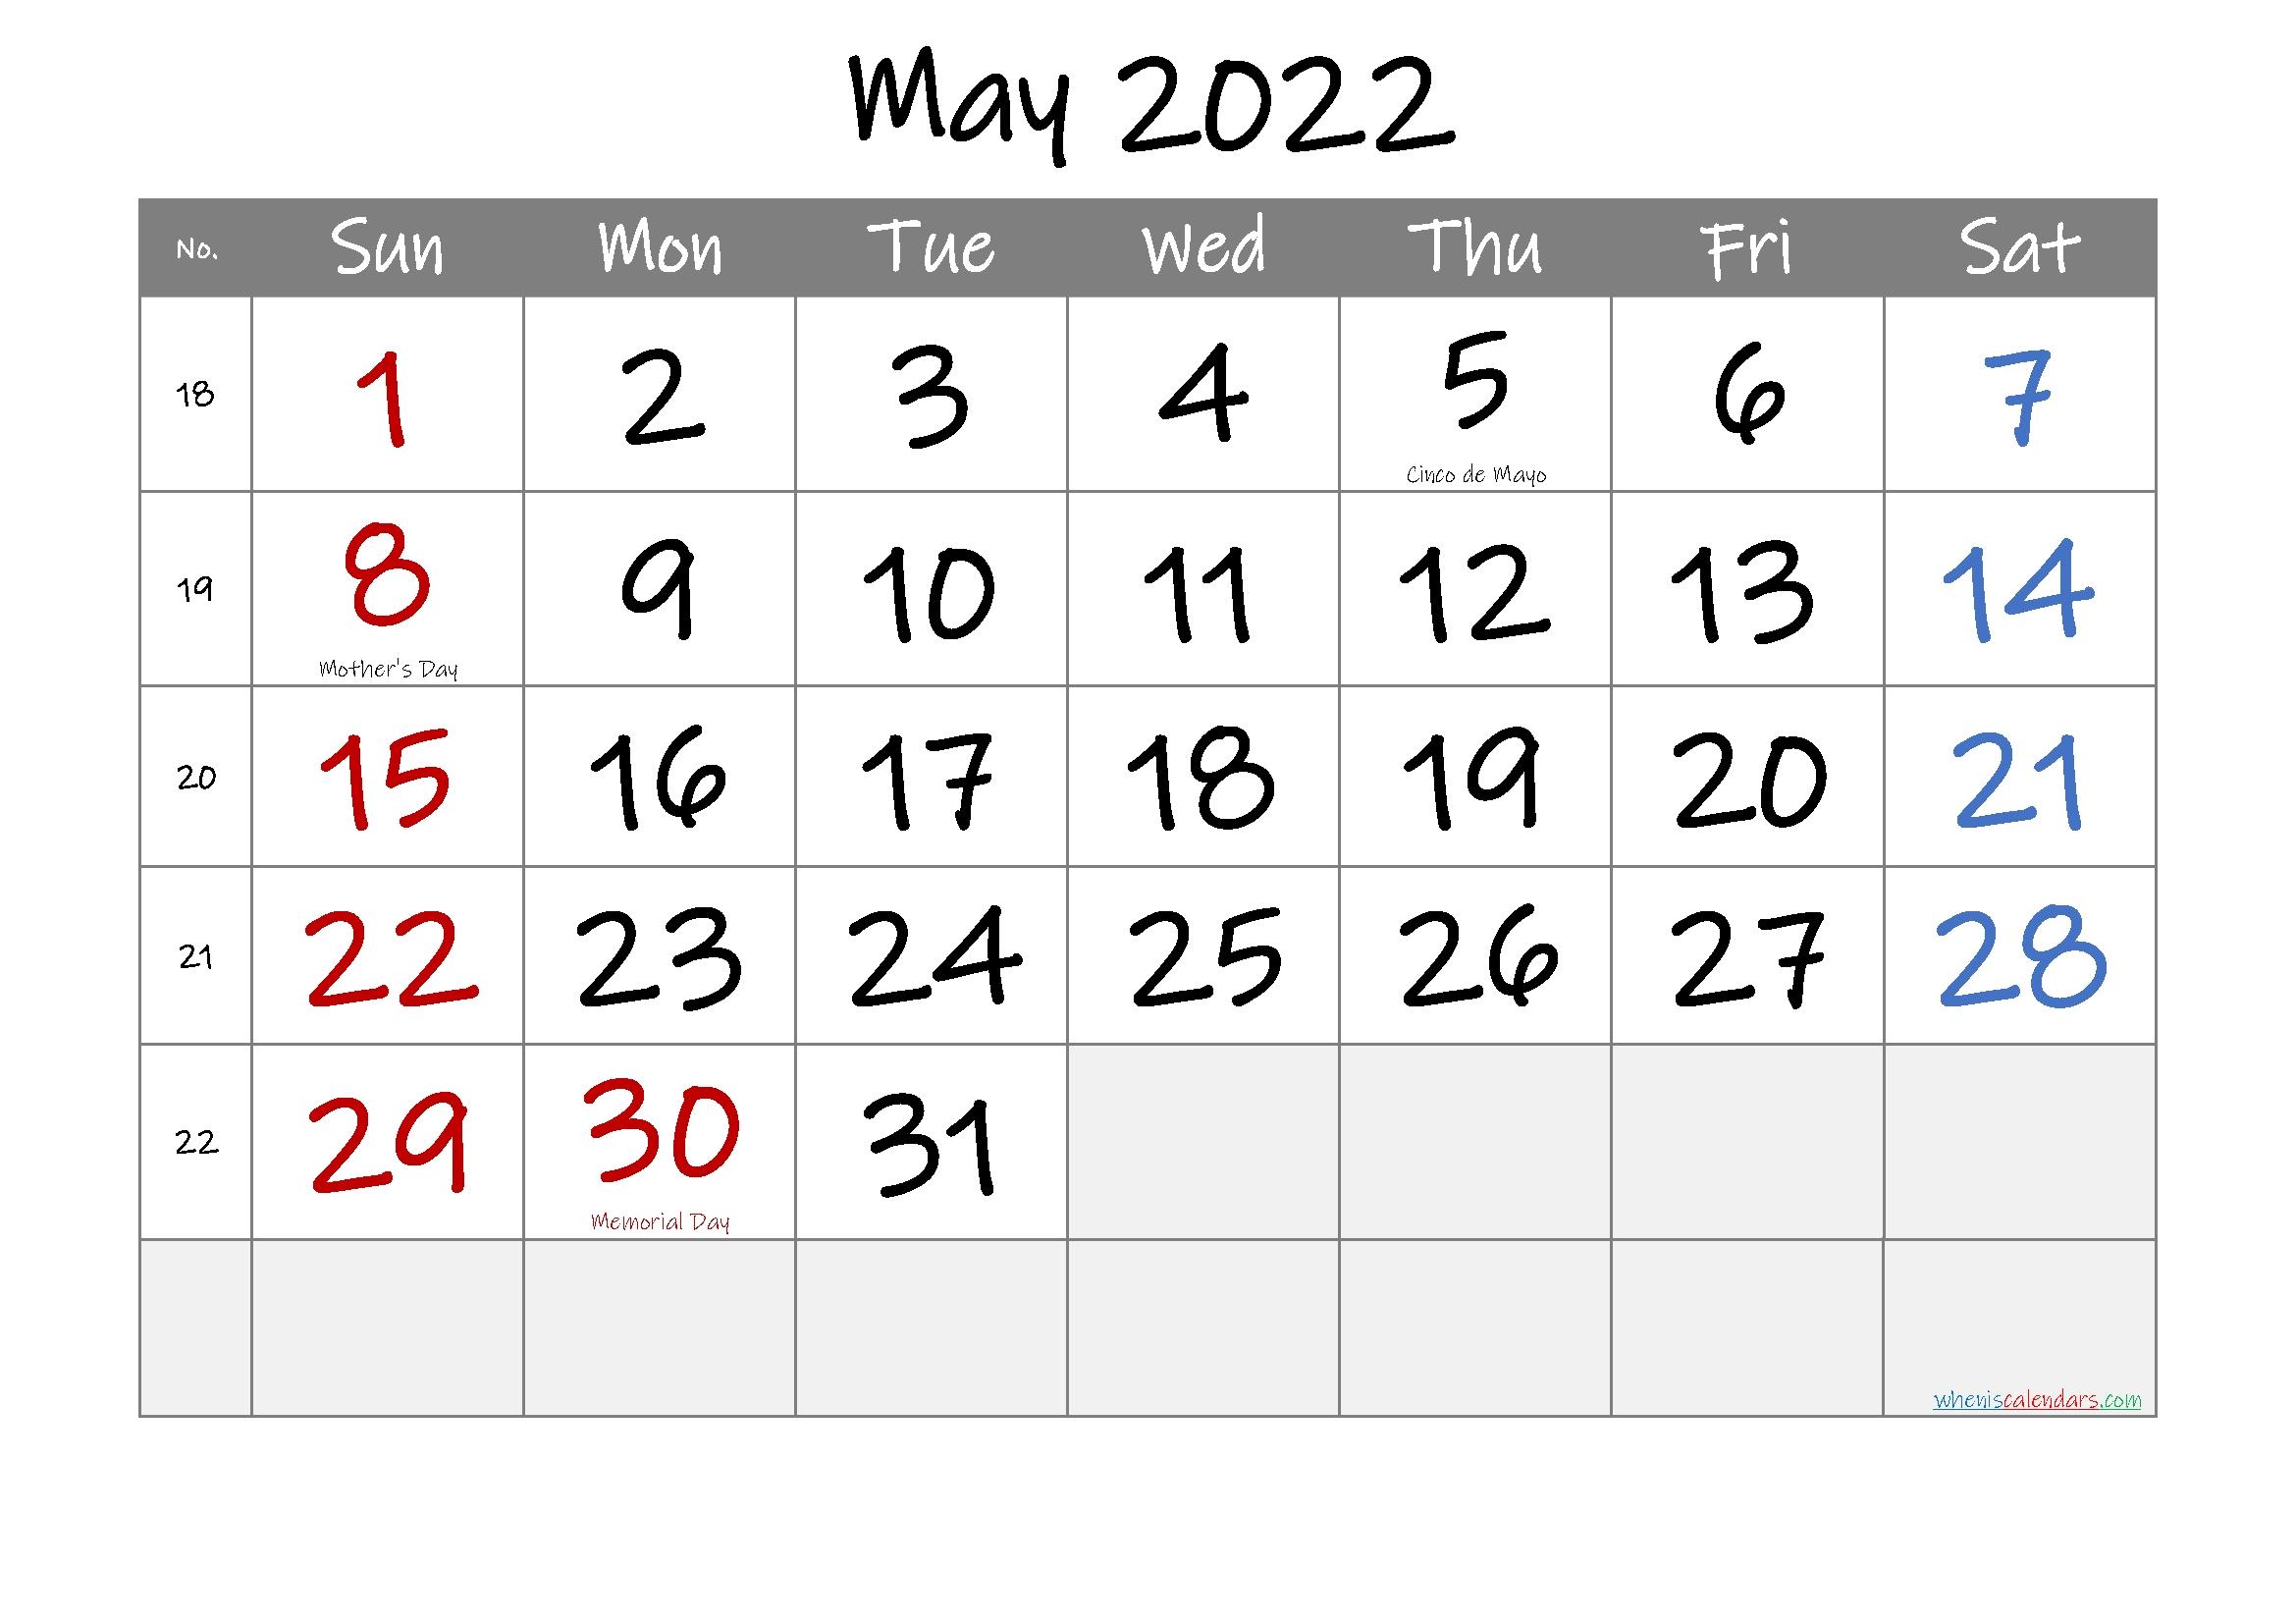 May 2022 Free Printable Calendar-Template No.if22M29 - Free